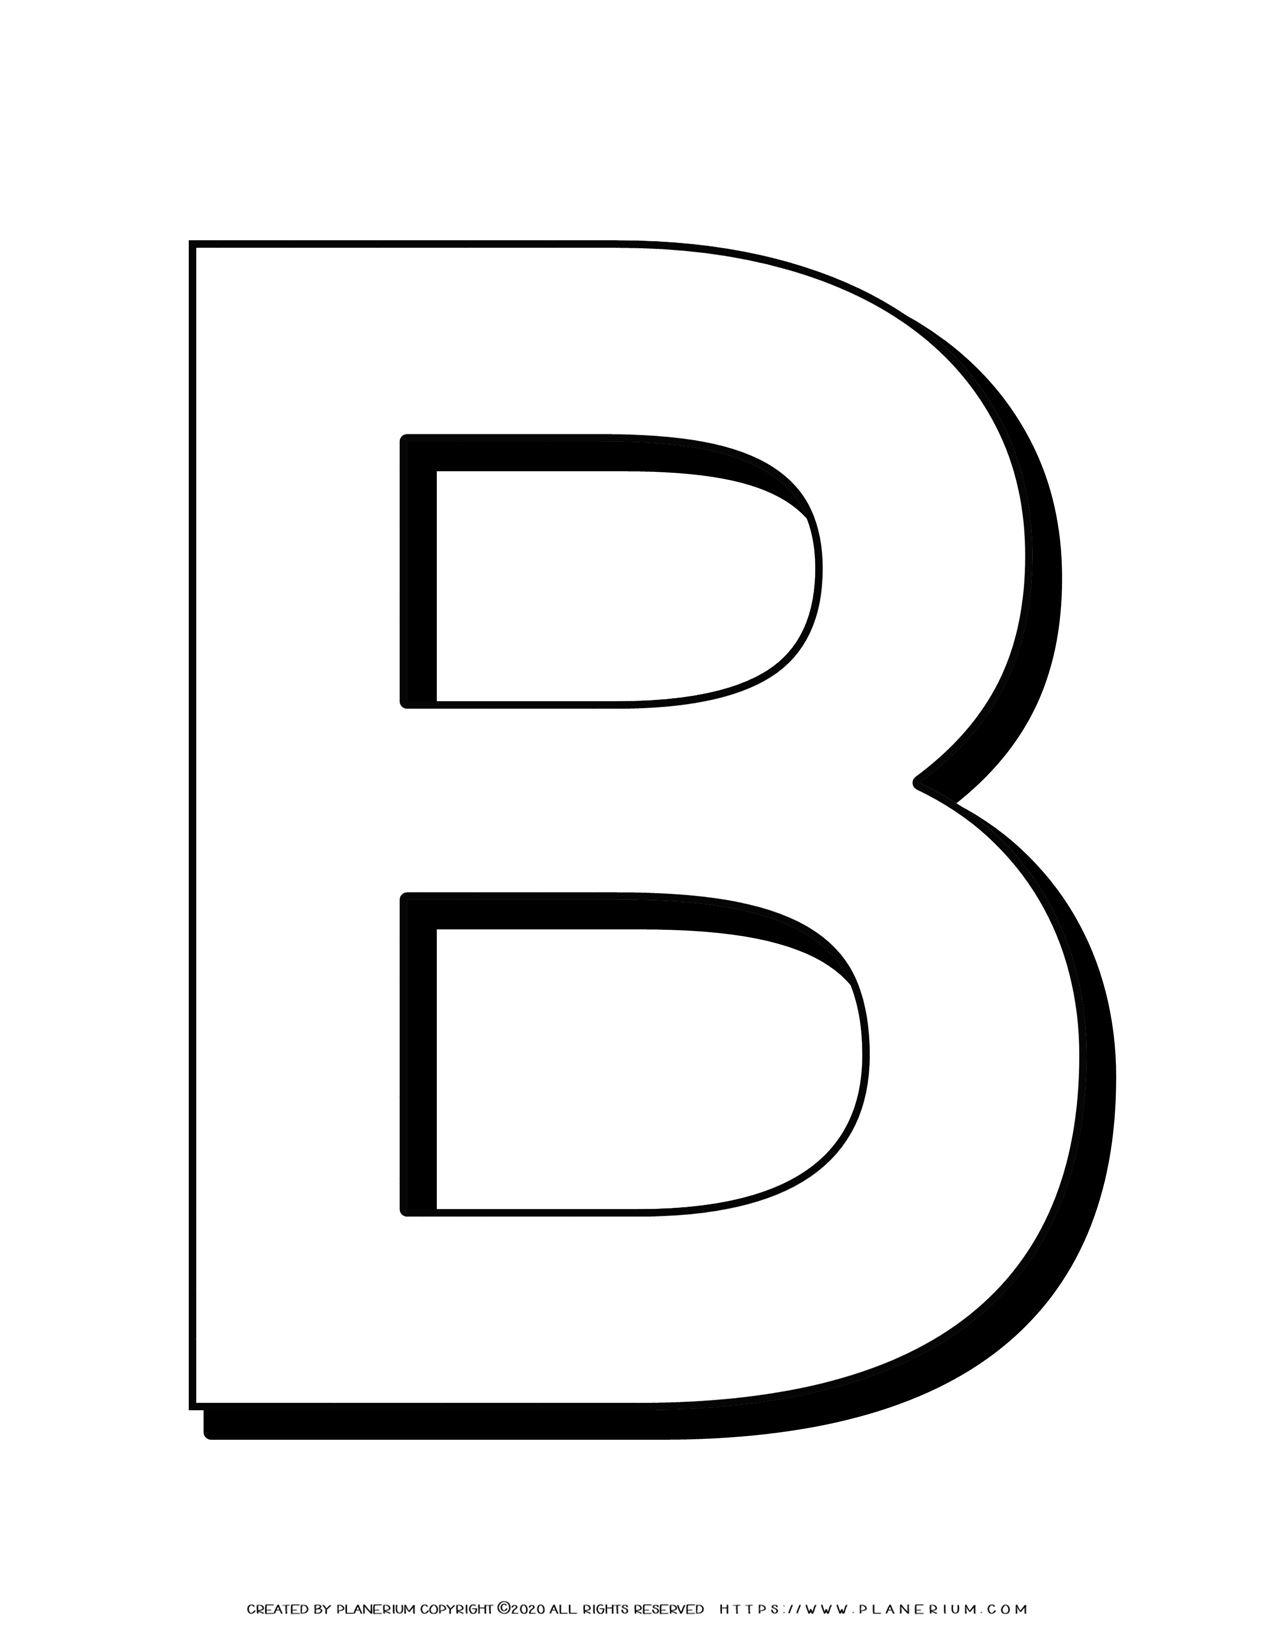 Alphabet Coloring Pages - English Letters - Capital B | Planerium